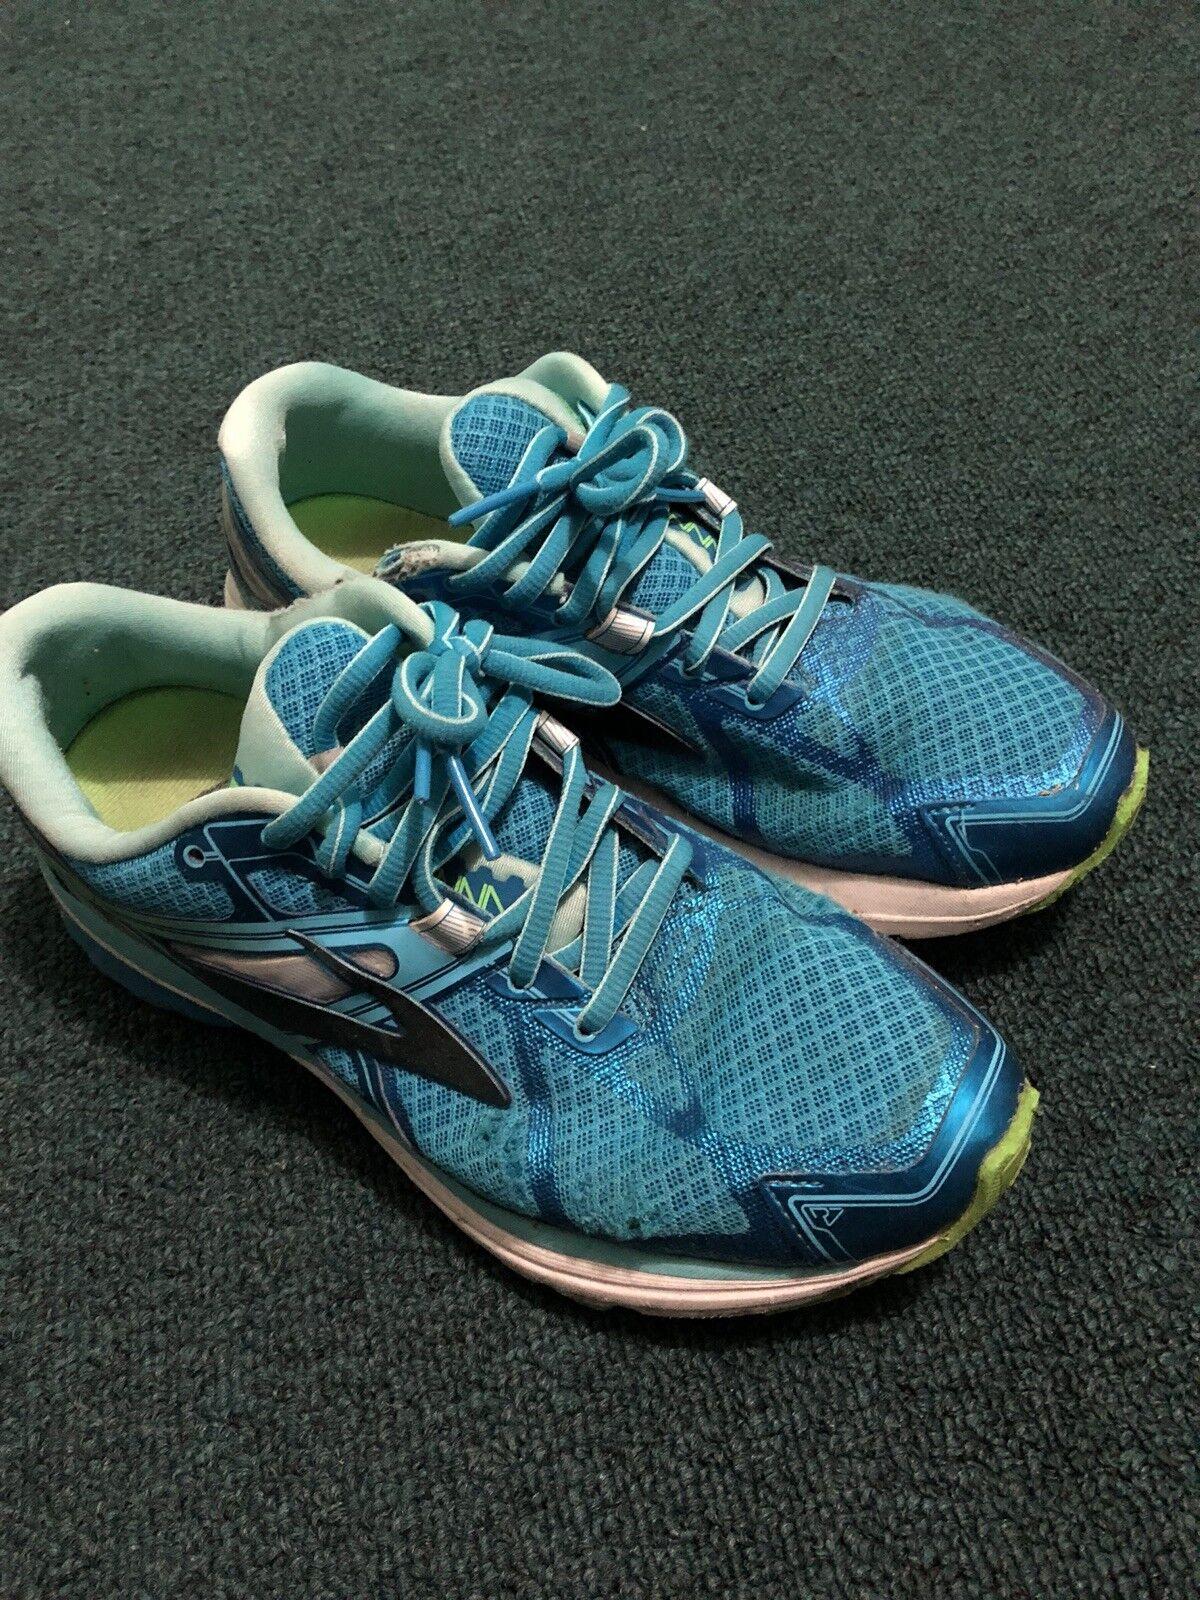 ASICS Women's GEL-Exalt Trail Running Athletic shoes US 9 Green-bluee Aqua